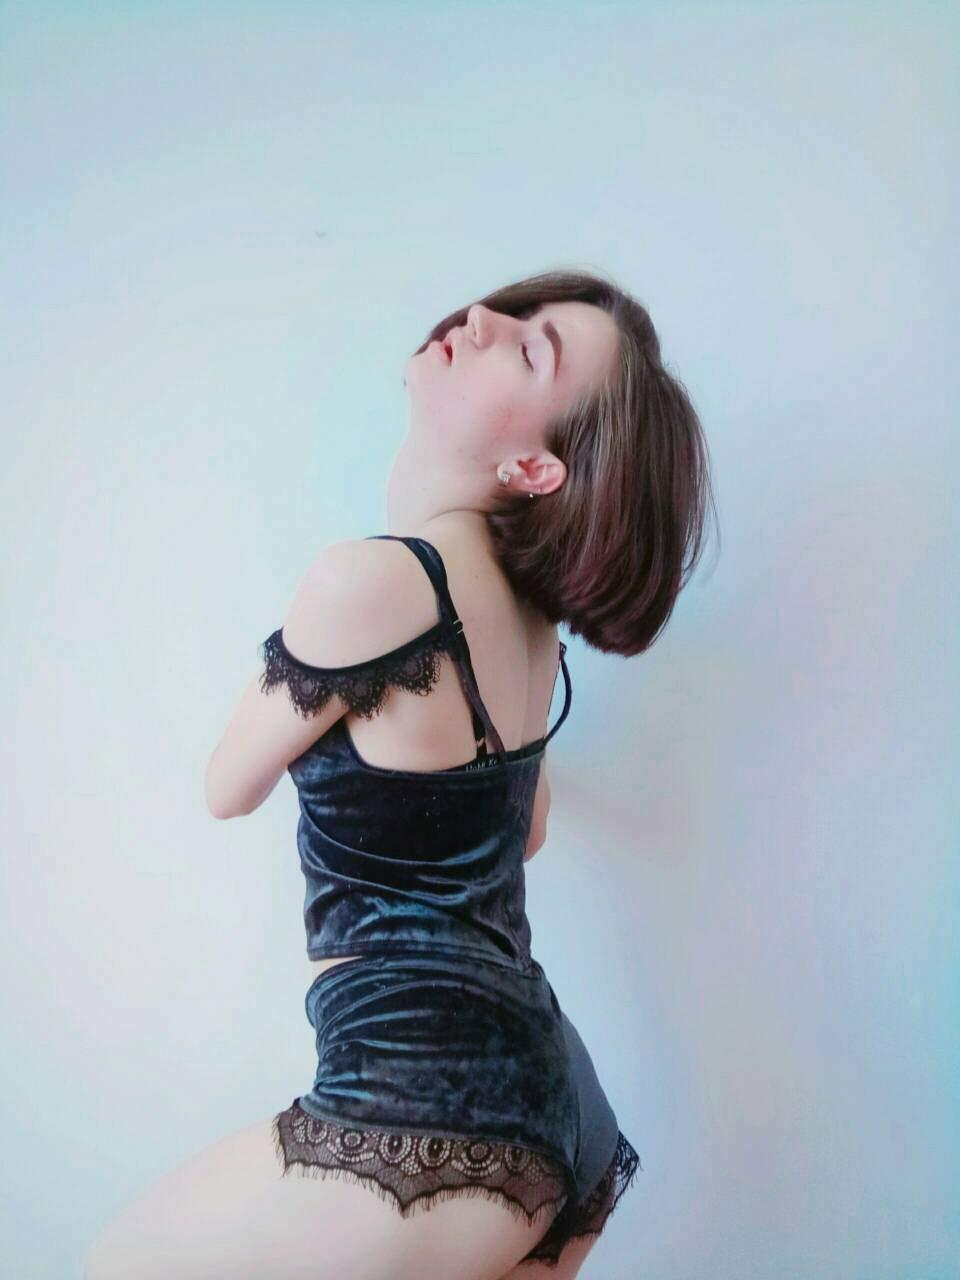 c42e00843fb14 ♥BUY 2 GET 3♥ Lace Lingerie Pajama Velvet Pajama Sissy Velvet Lingerie  Pyjamas Bralette Strappy Sleepwear High Waist Panties Harness Garter Belt  Strappy ...